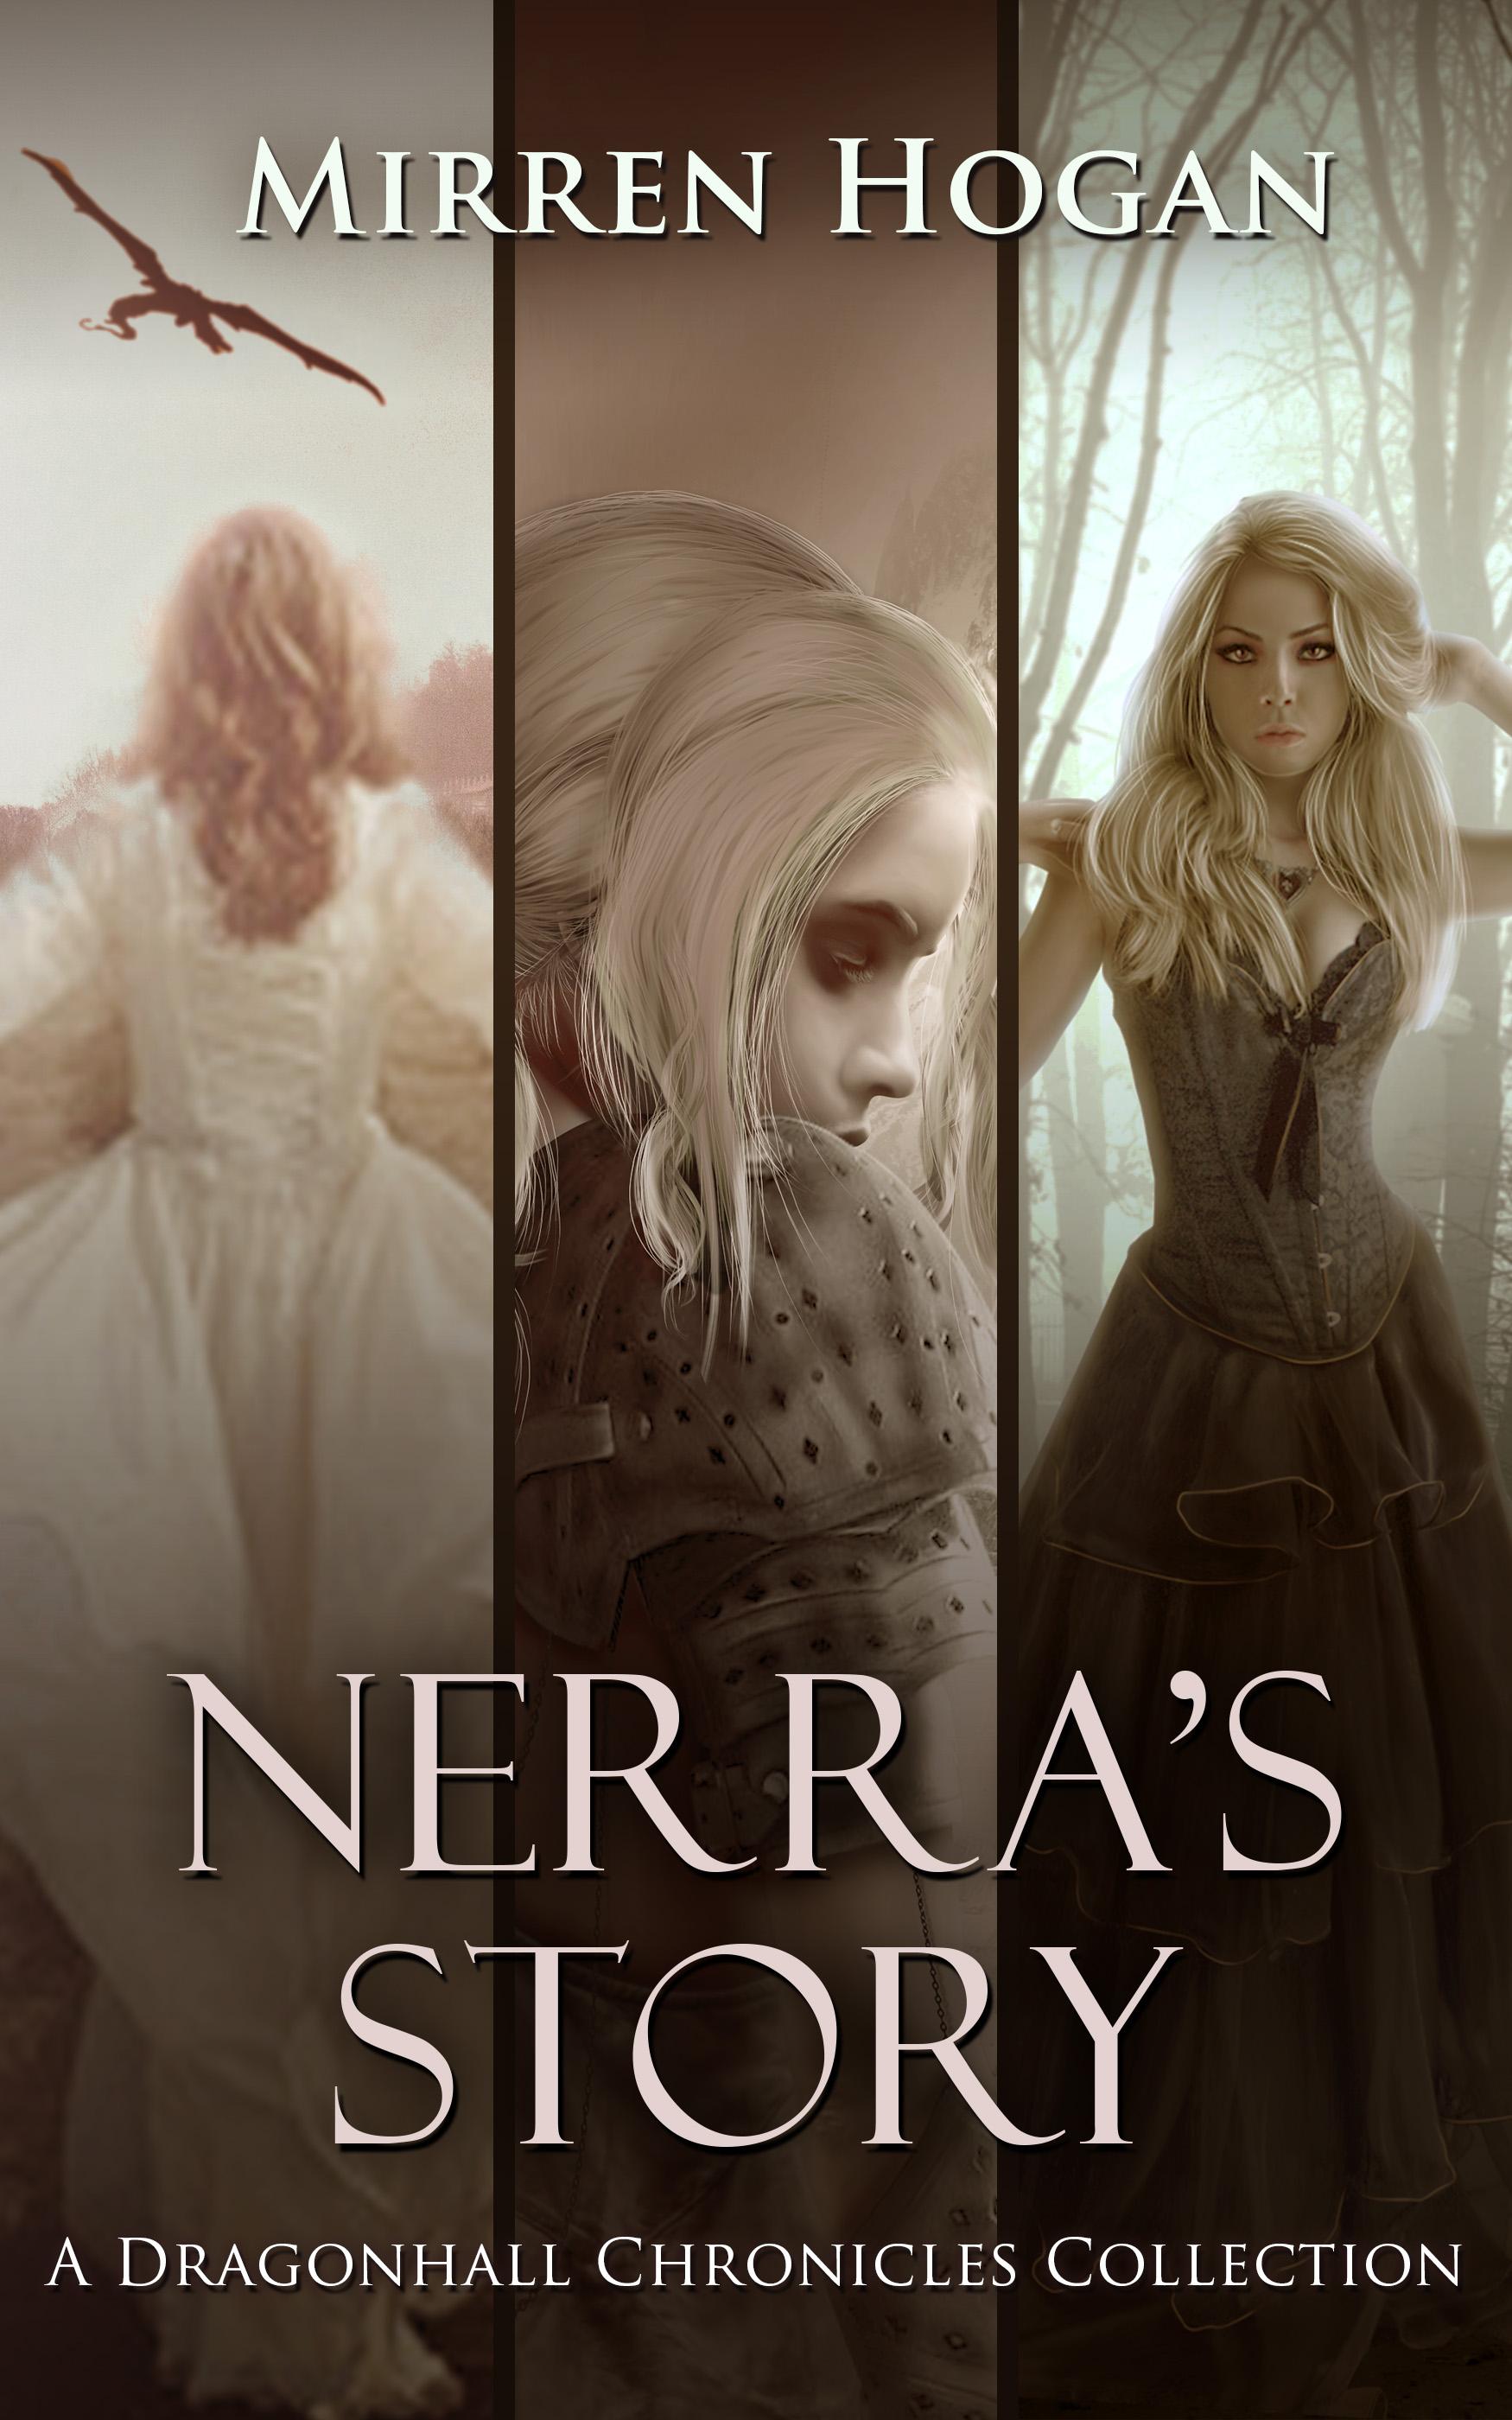 Nerra's Story